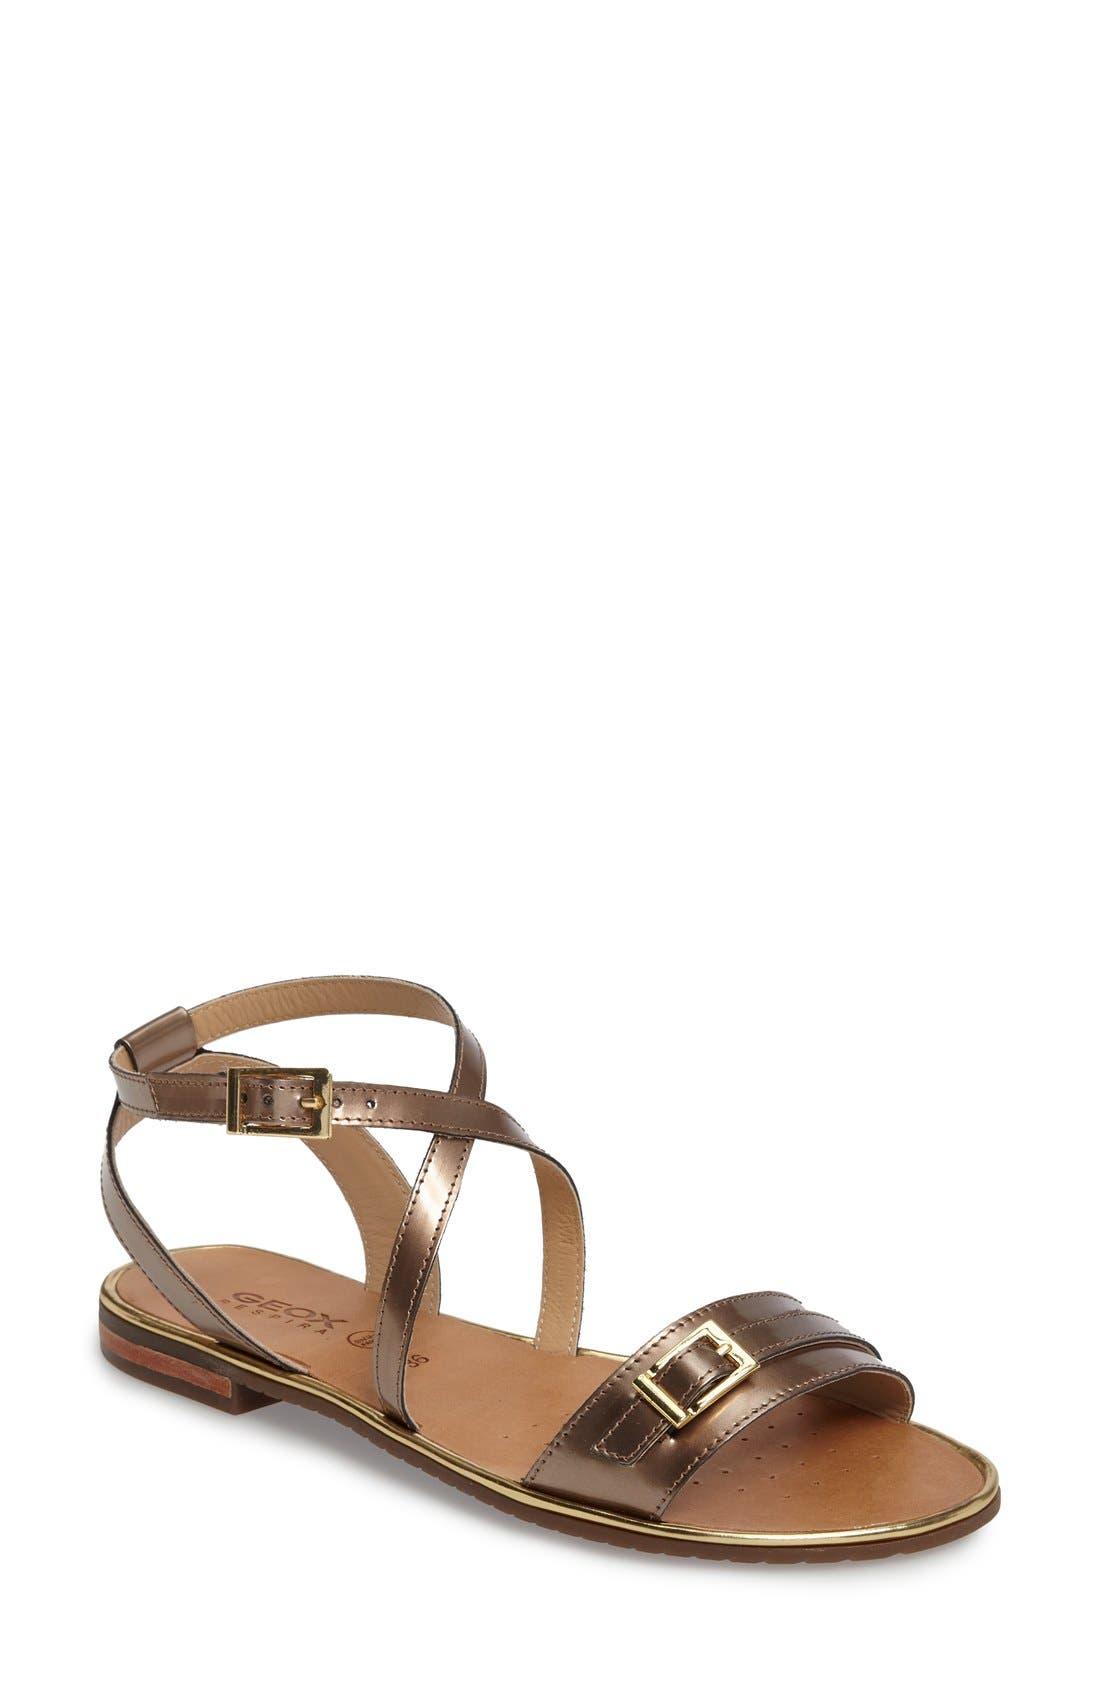 Main Image - Geox 'Sozy' Sandal (Women)